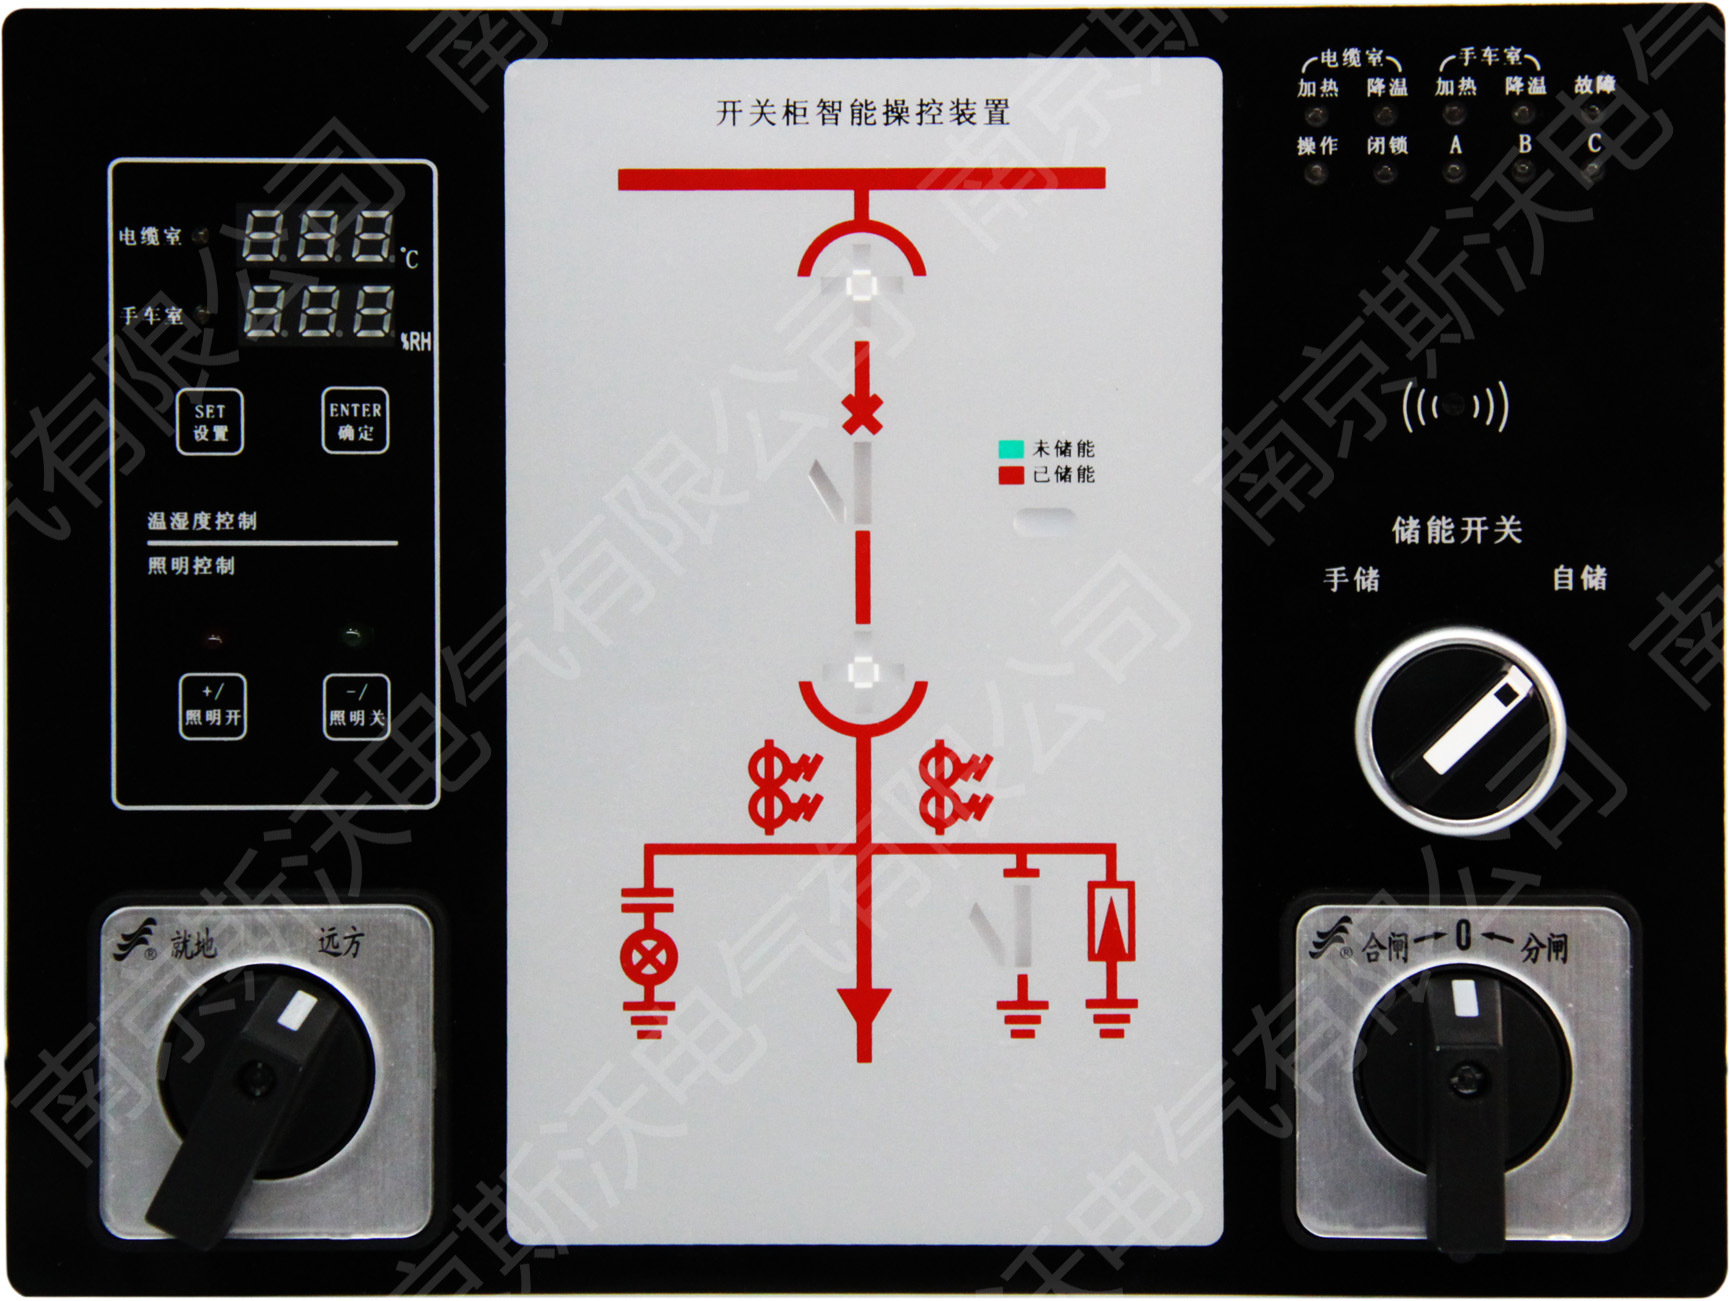 http://img.china.alibaba.com/img/ibank/2015/147/505/2375505741_1162758429.jpg